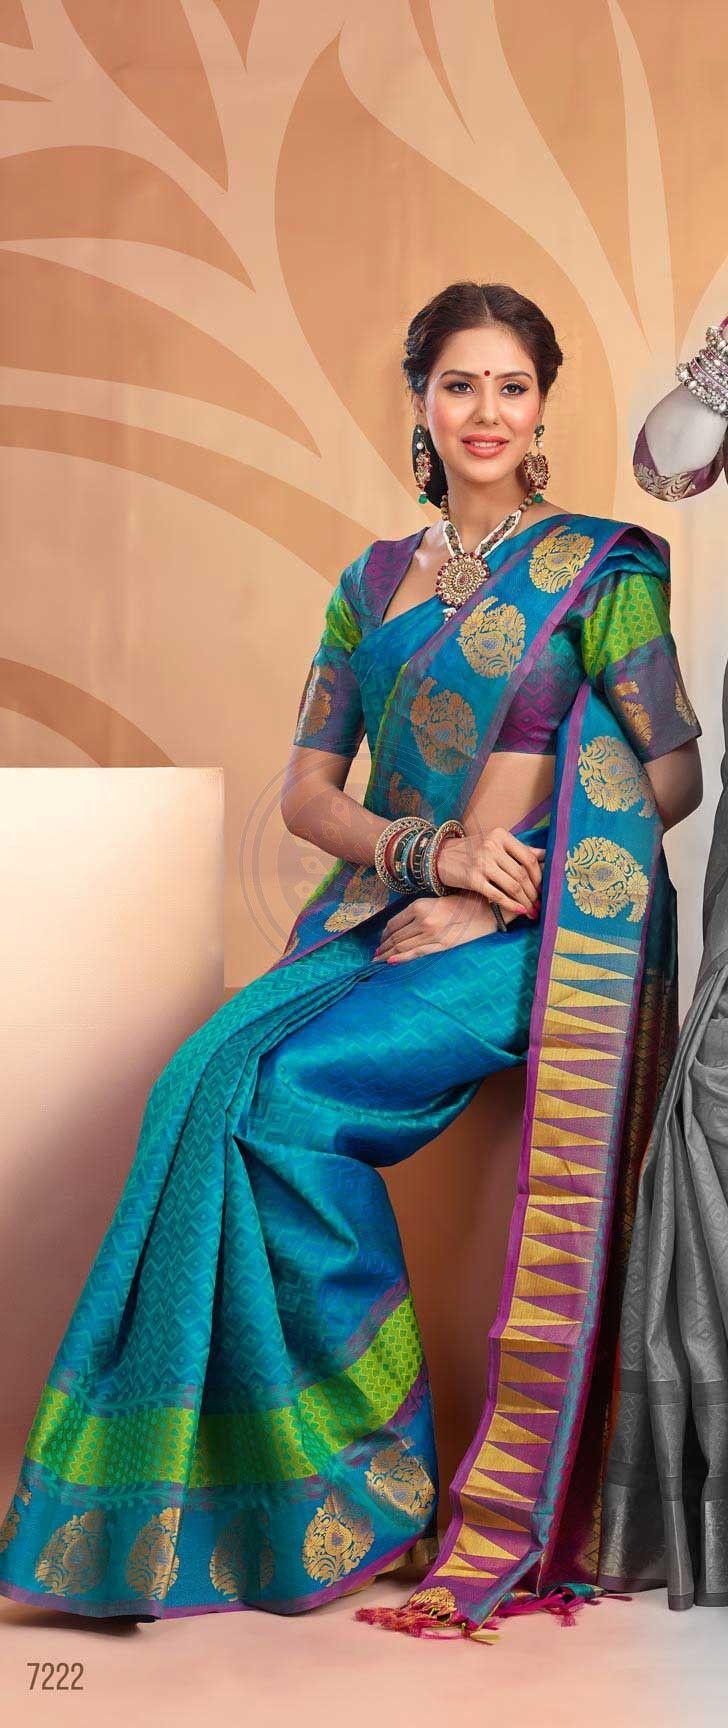 27 Best Silk Saress Images On Pinterest  Wedding Sarees -4935